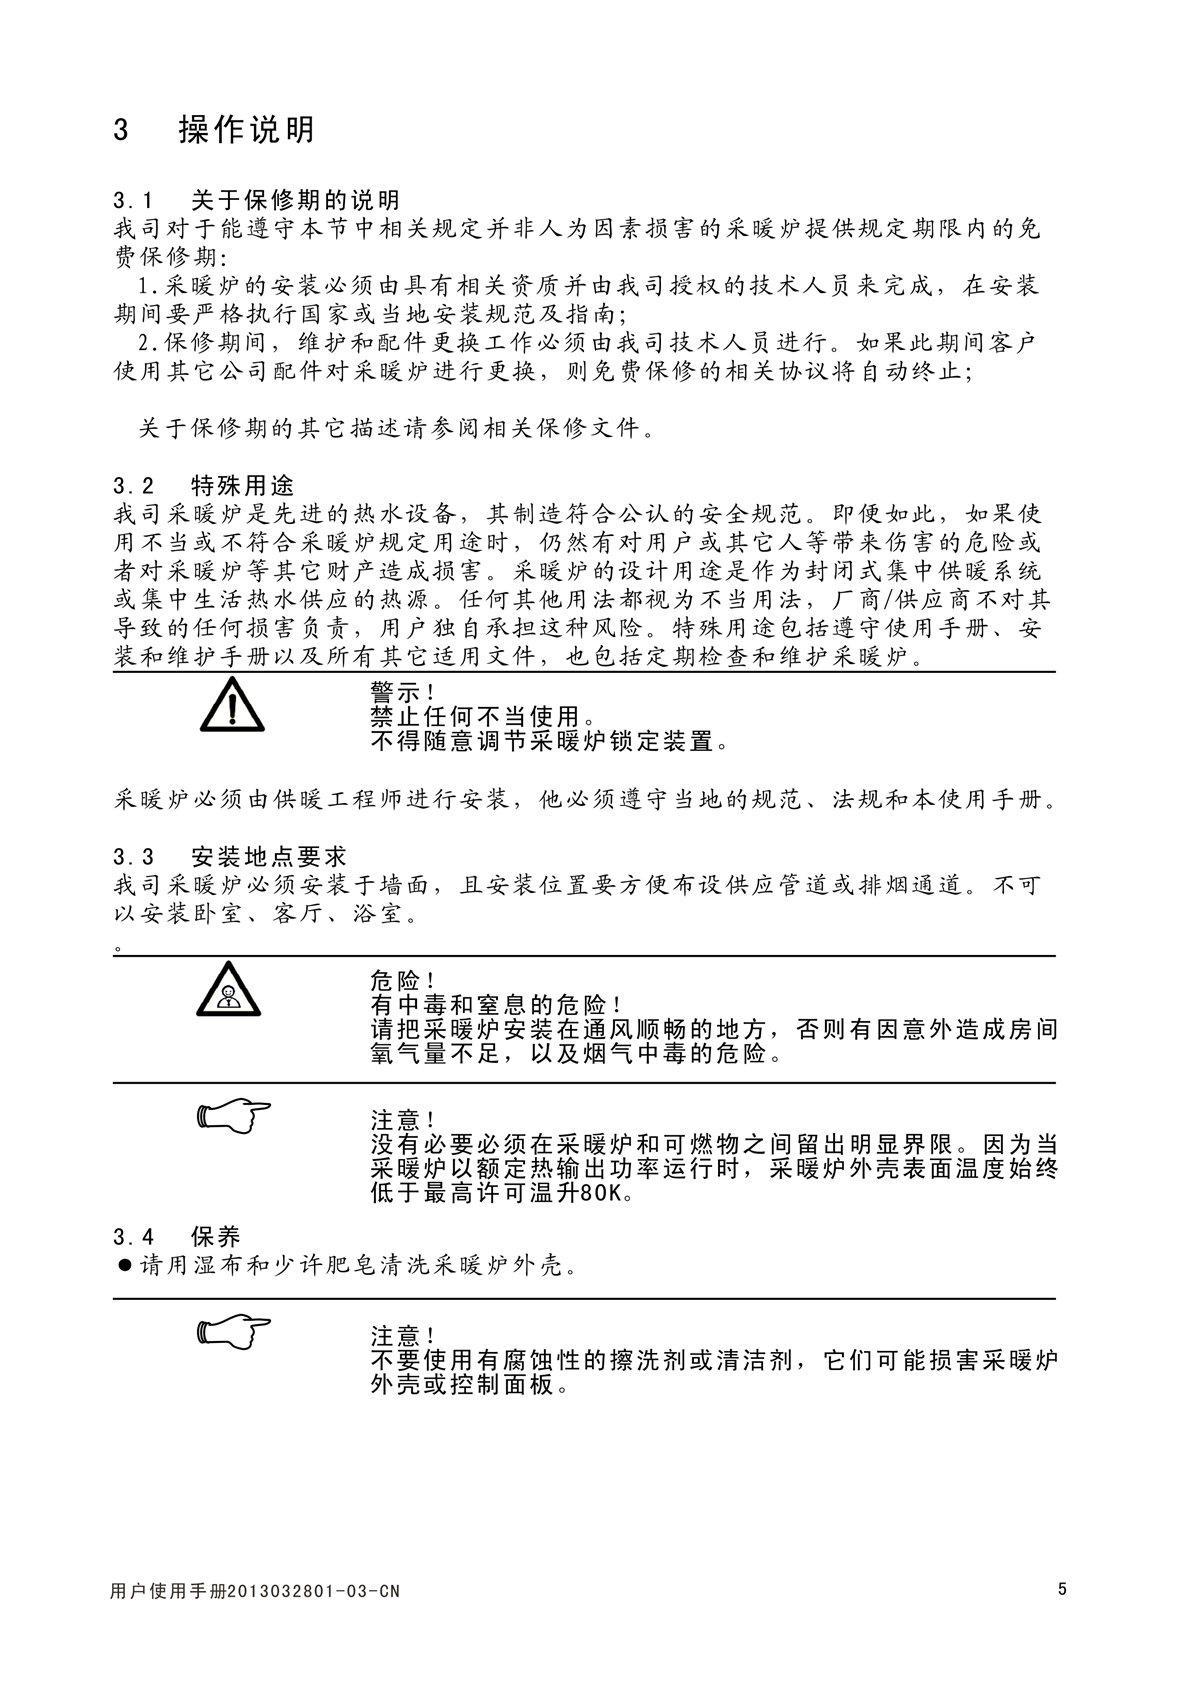 ES06系列-用户使用手册-6_02.jpg